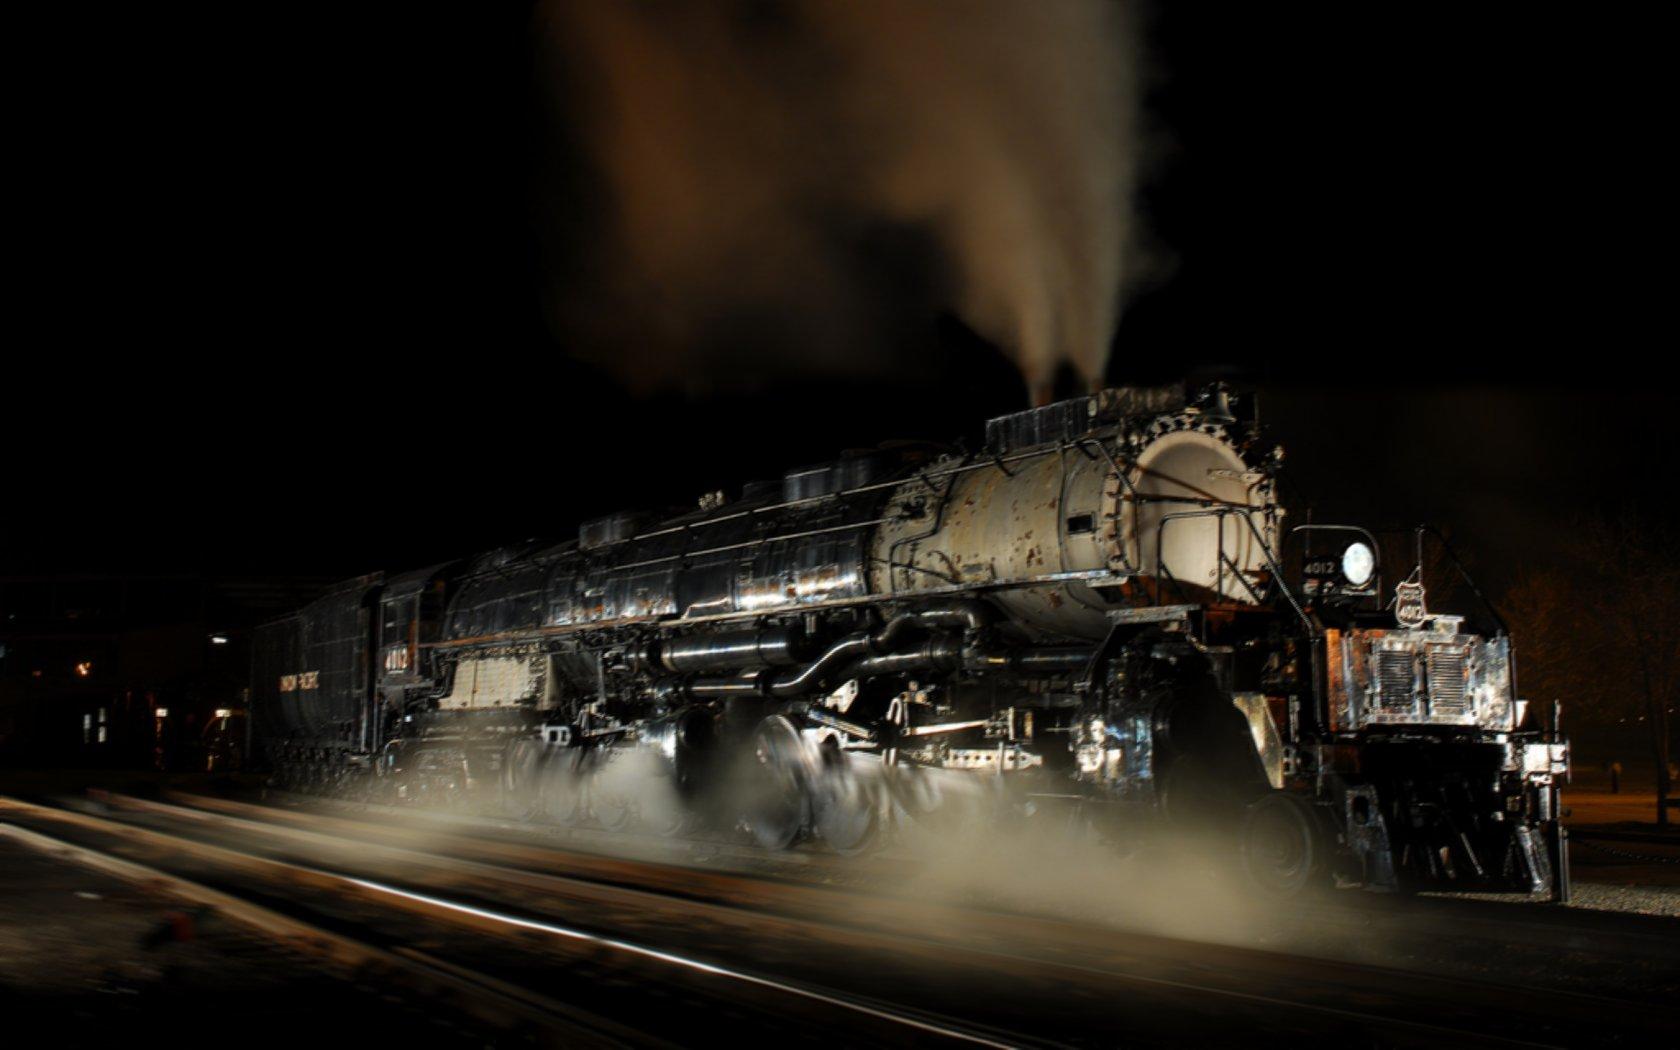 steam locomotive hd wallpapers - photo #13